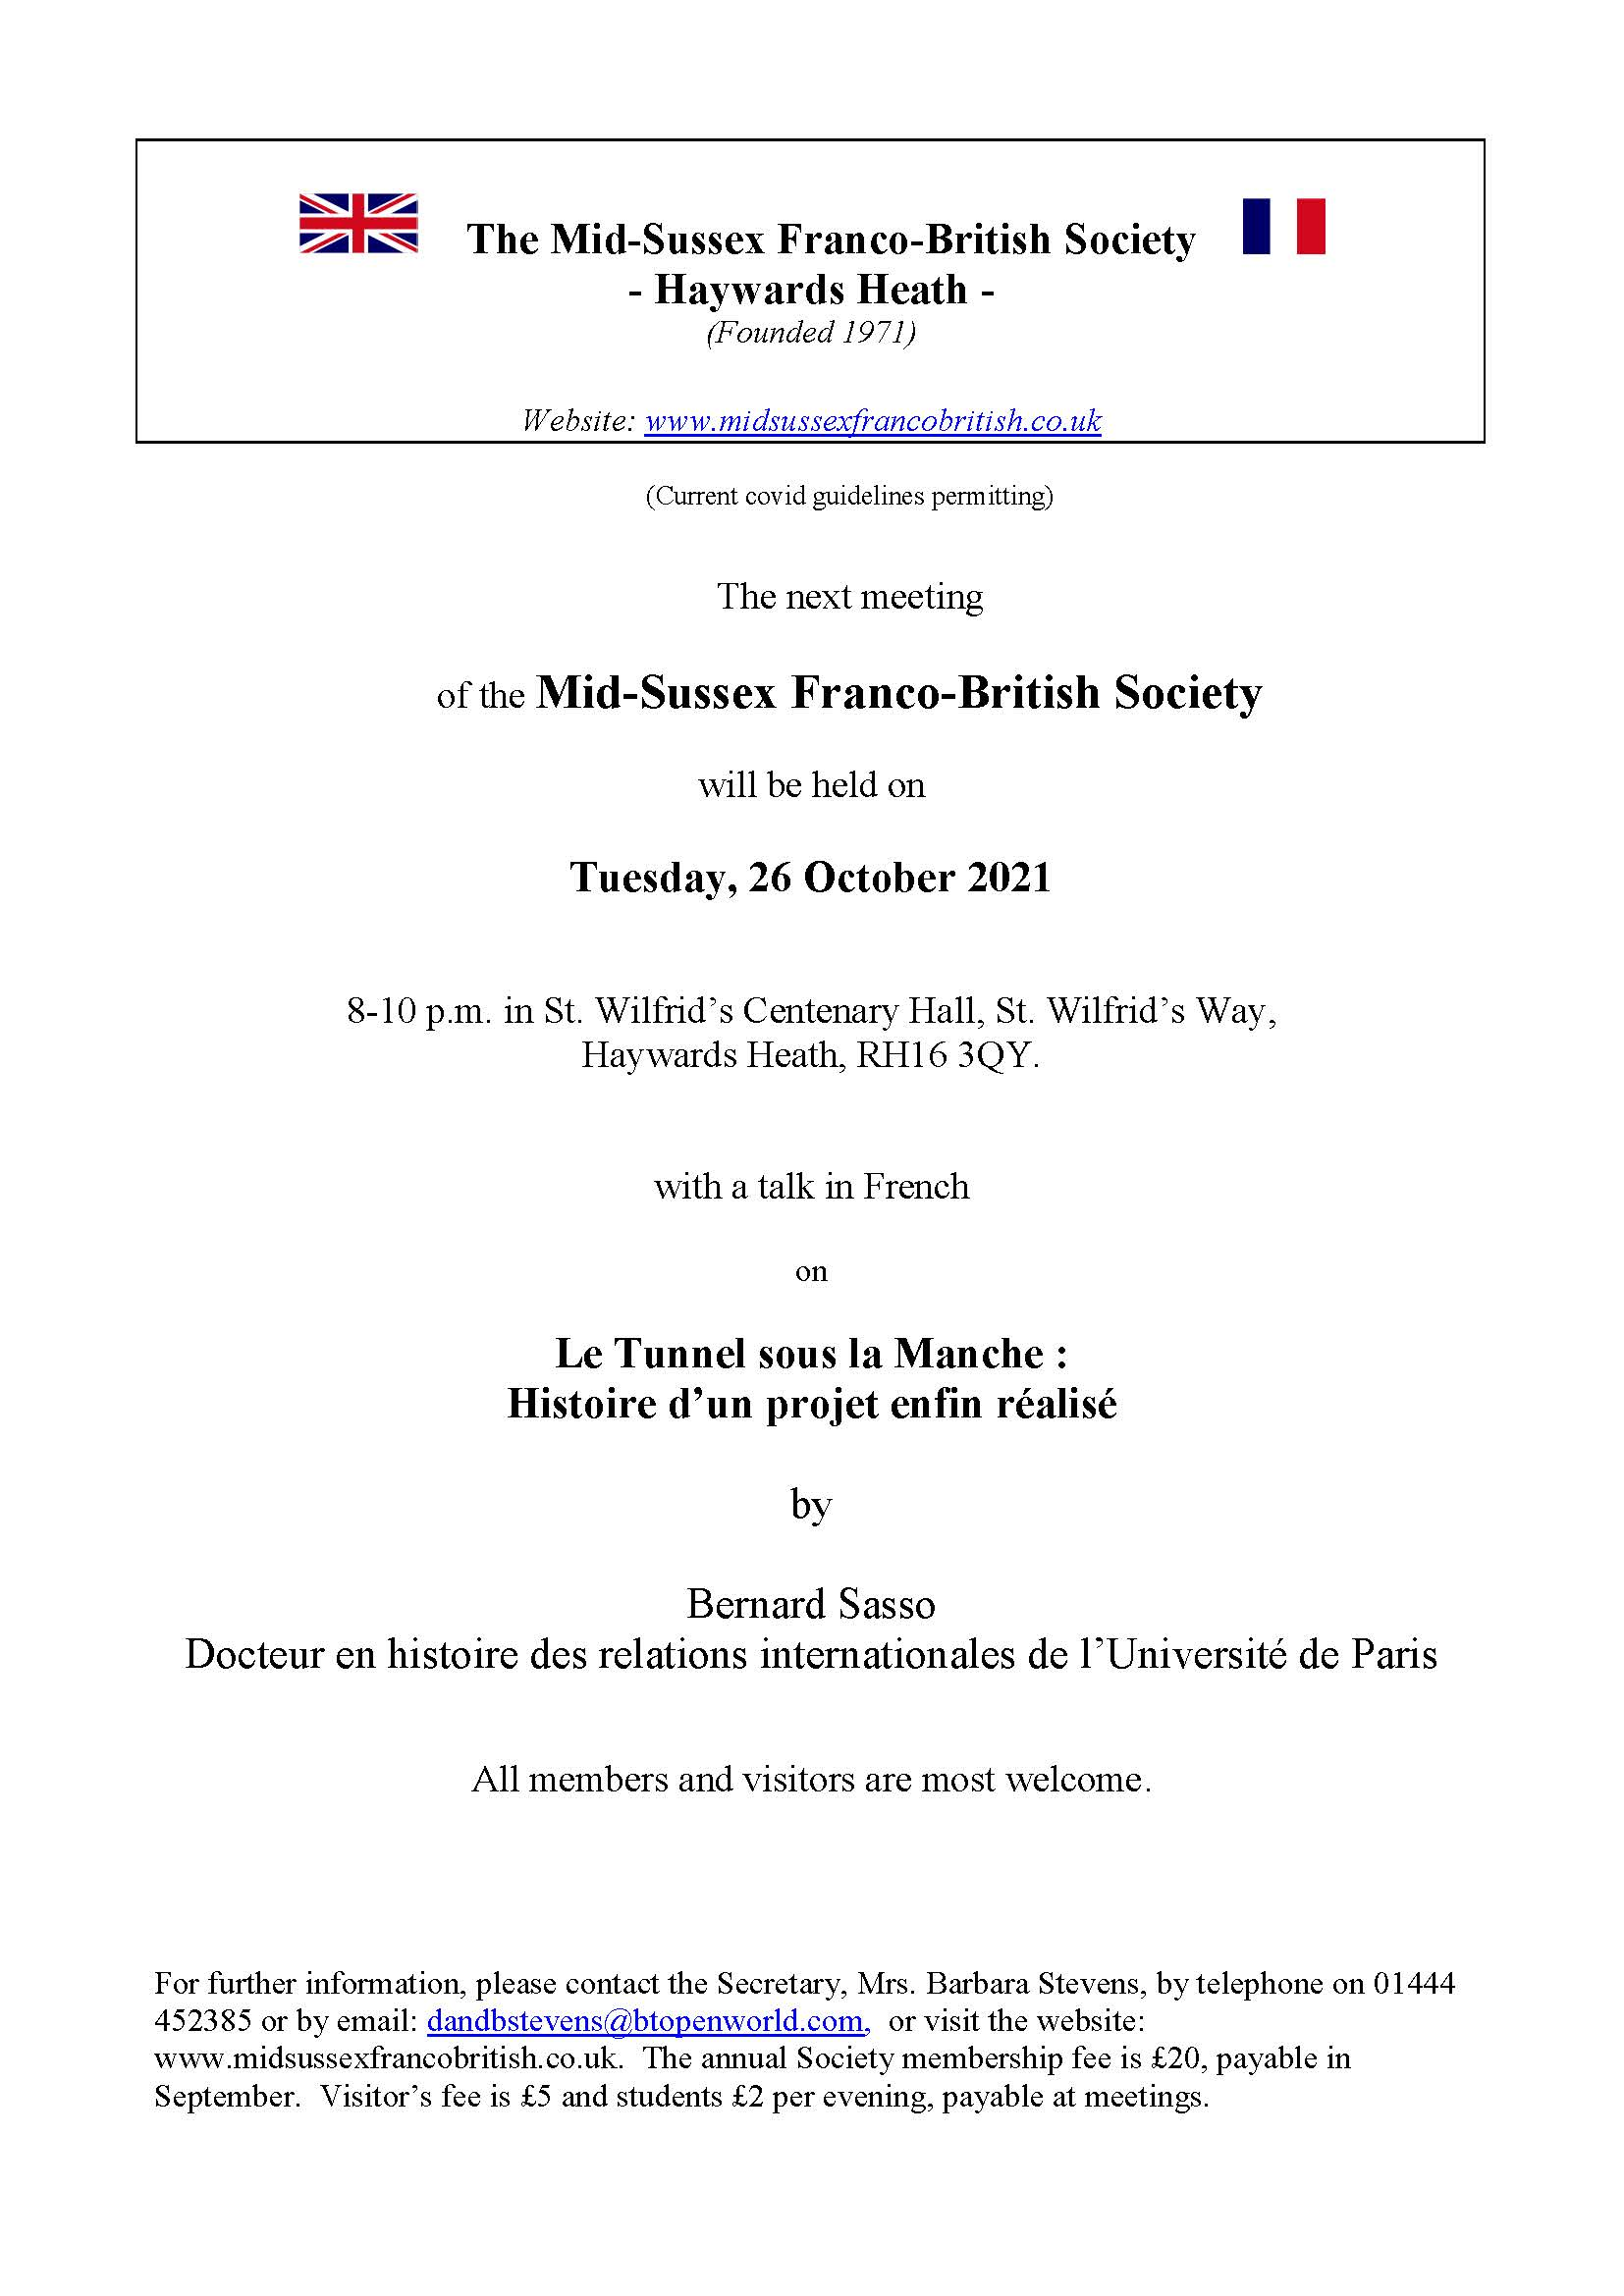 Mid Sussex Franco-British Society Channel Tunnel Talk